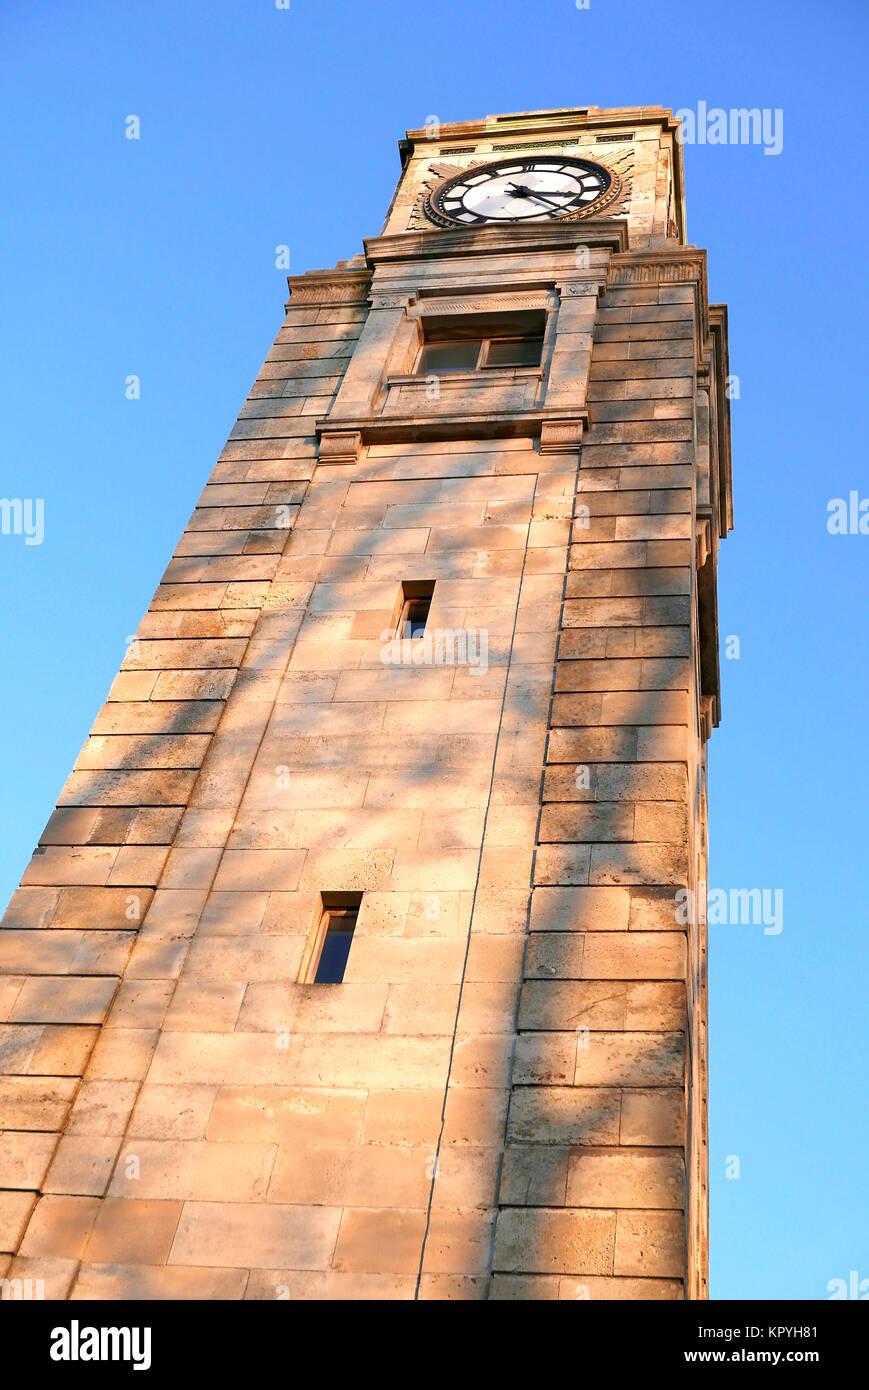 Cocker's clock tower in Stanley Park,Blackpool,Lancashie,UK Stock Photo